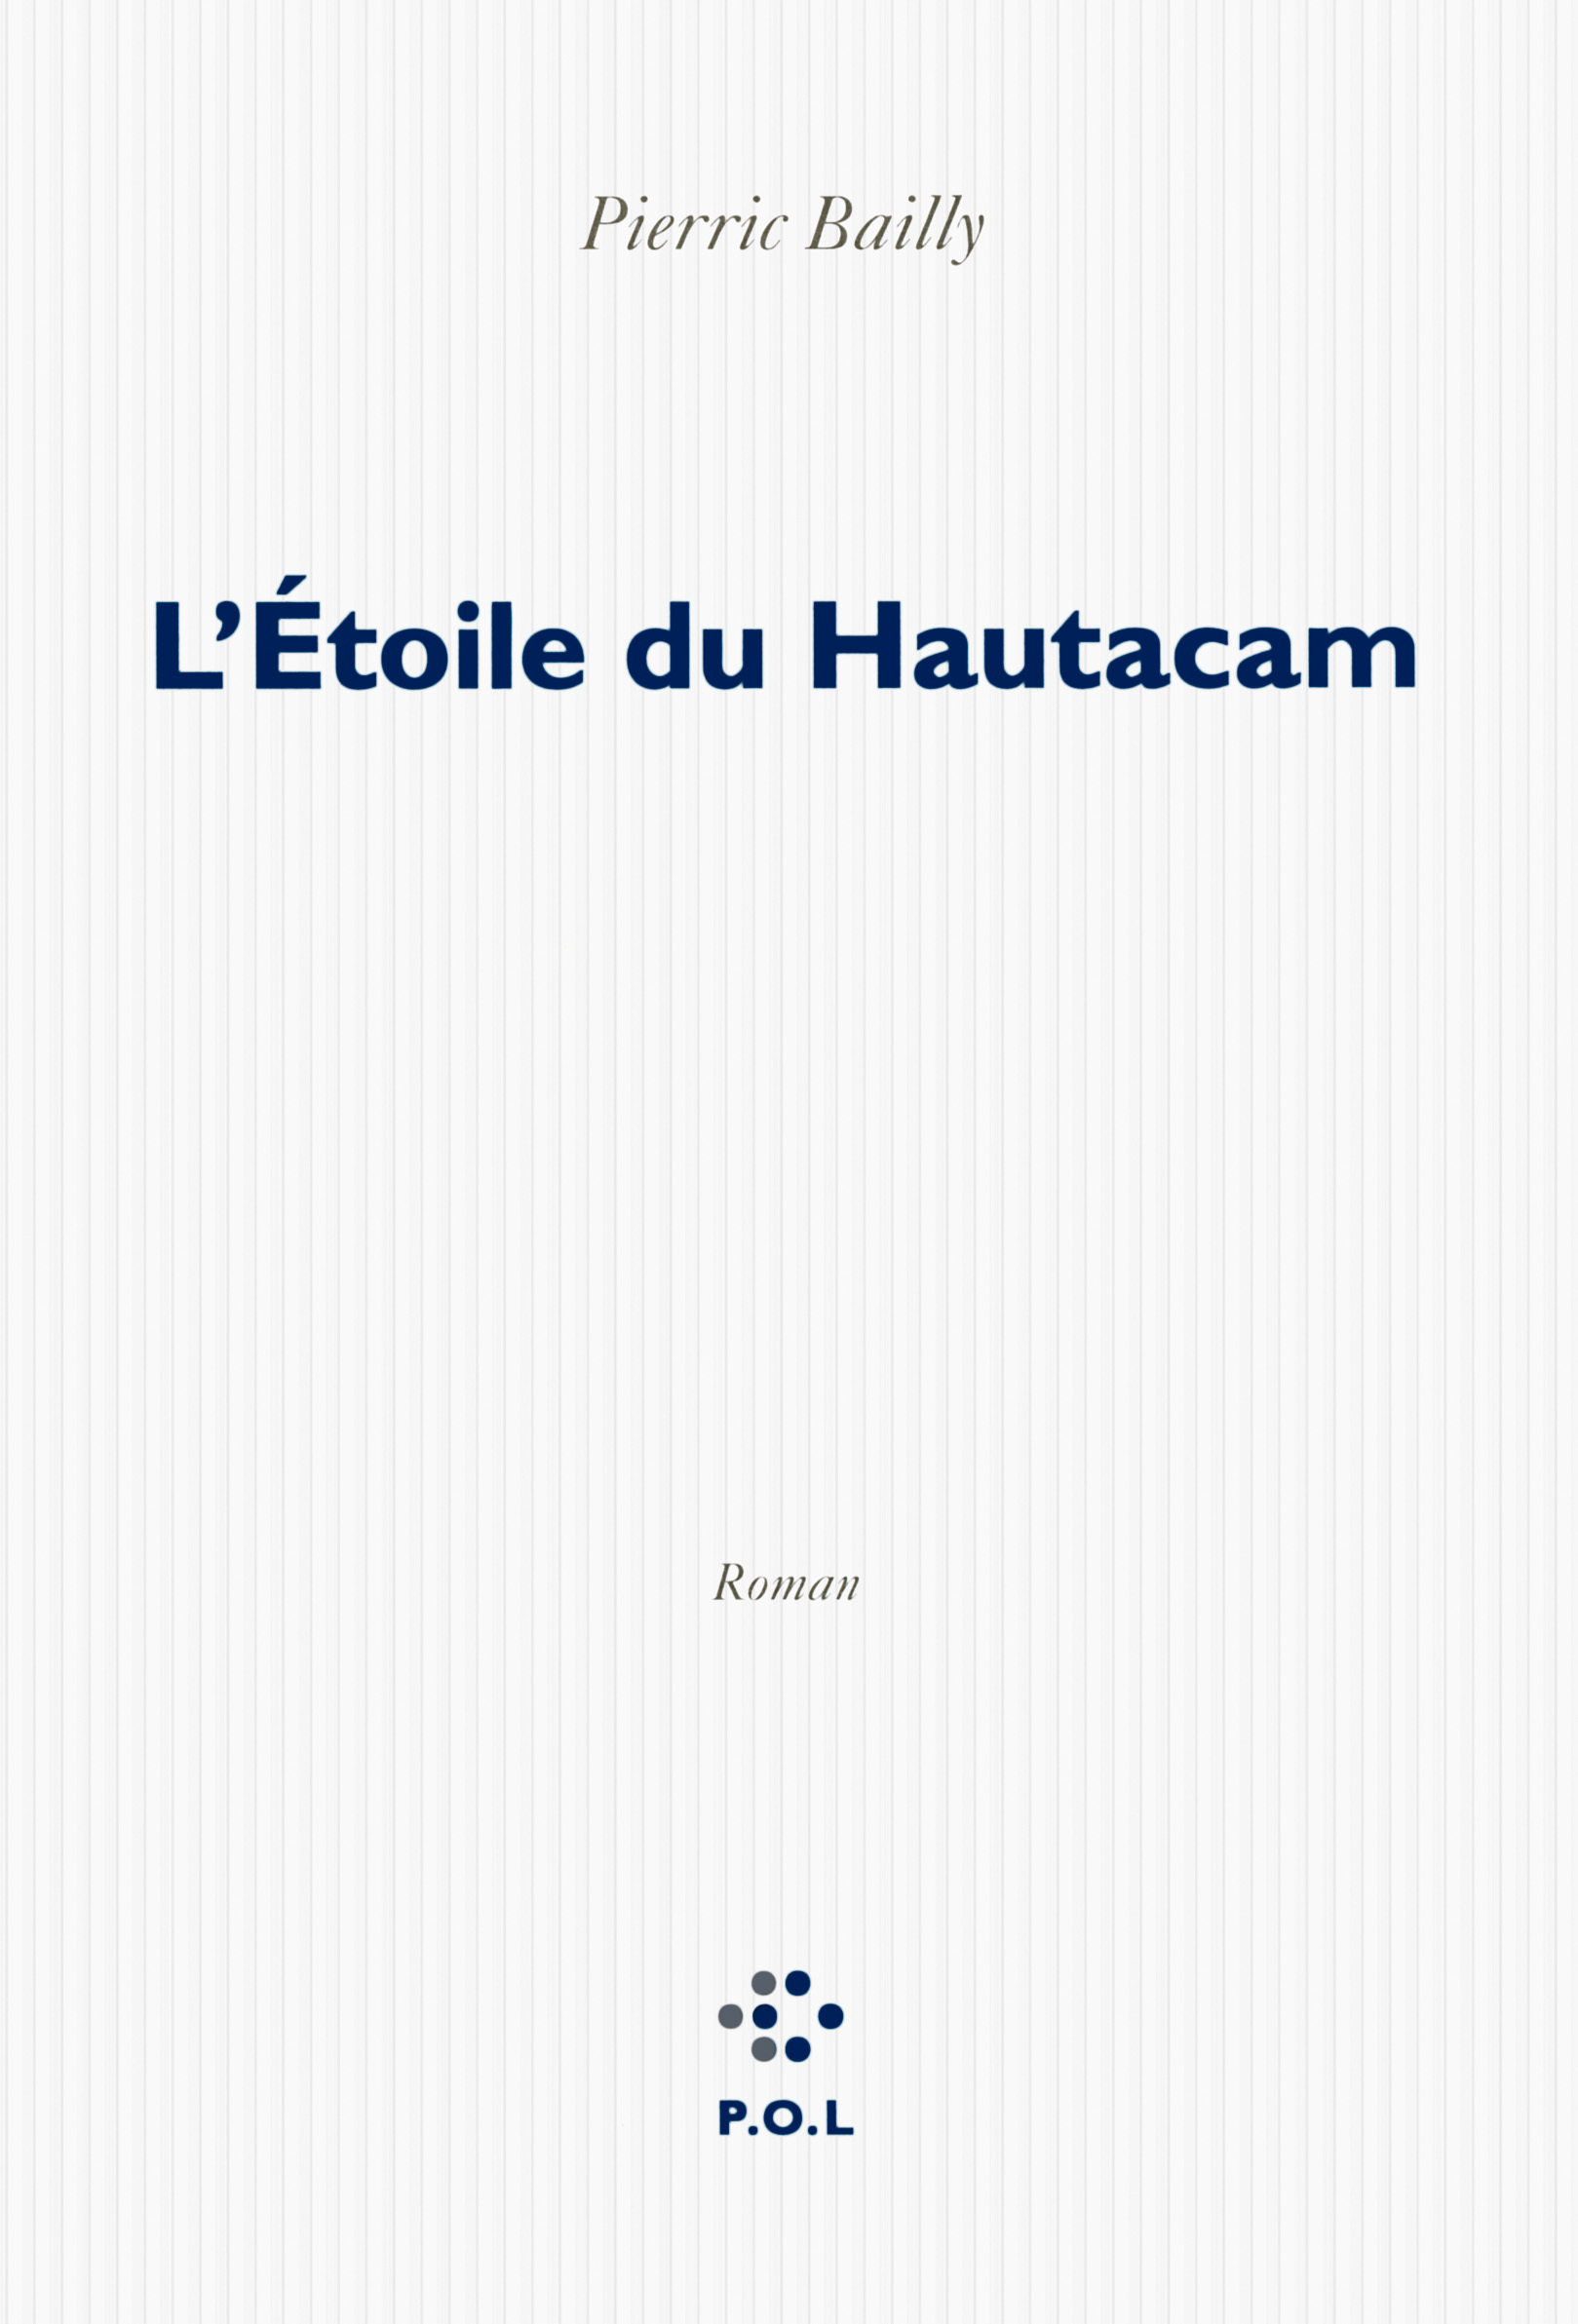 L'ETOILE DU HAUTACAM